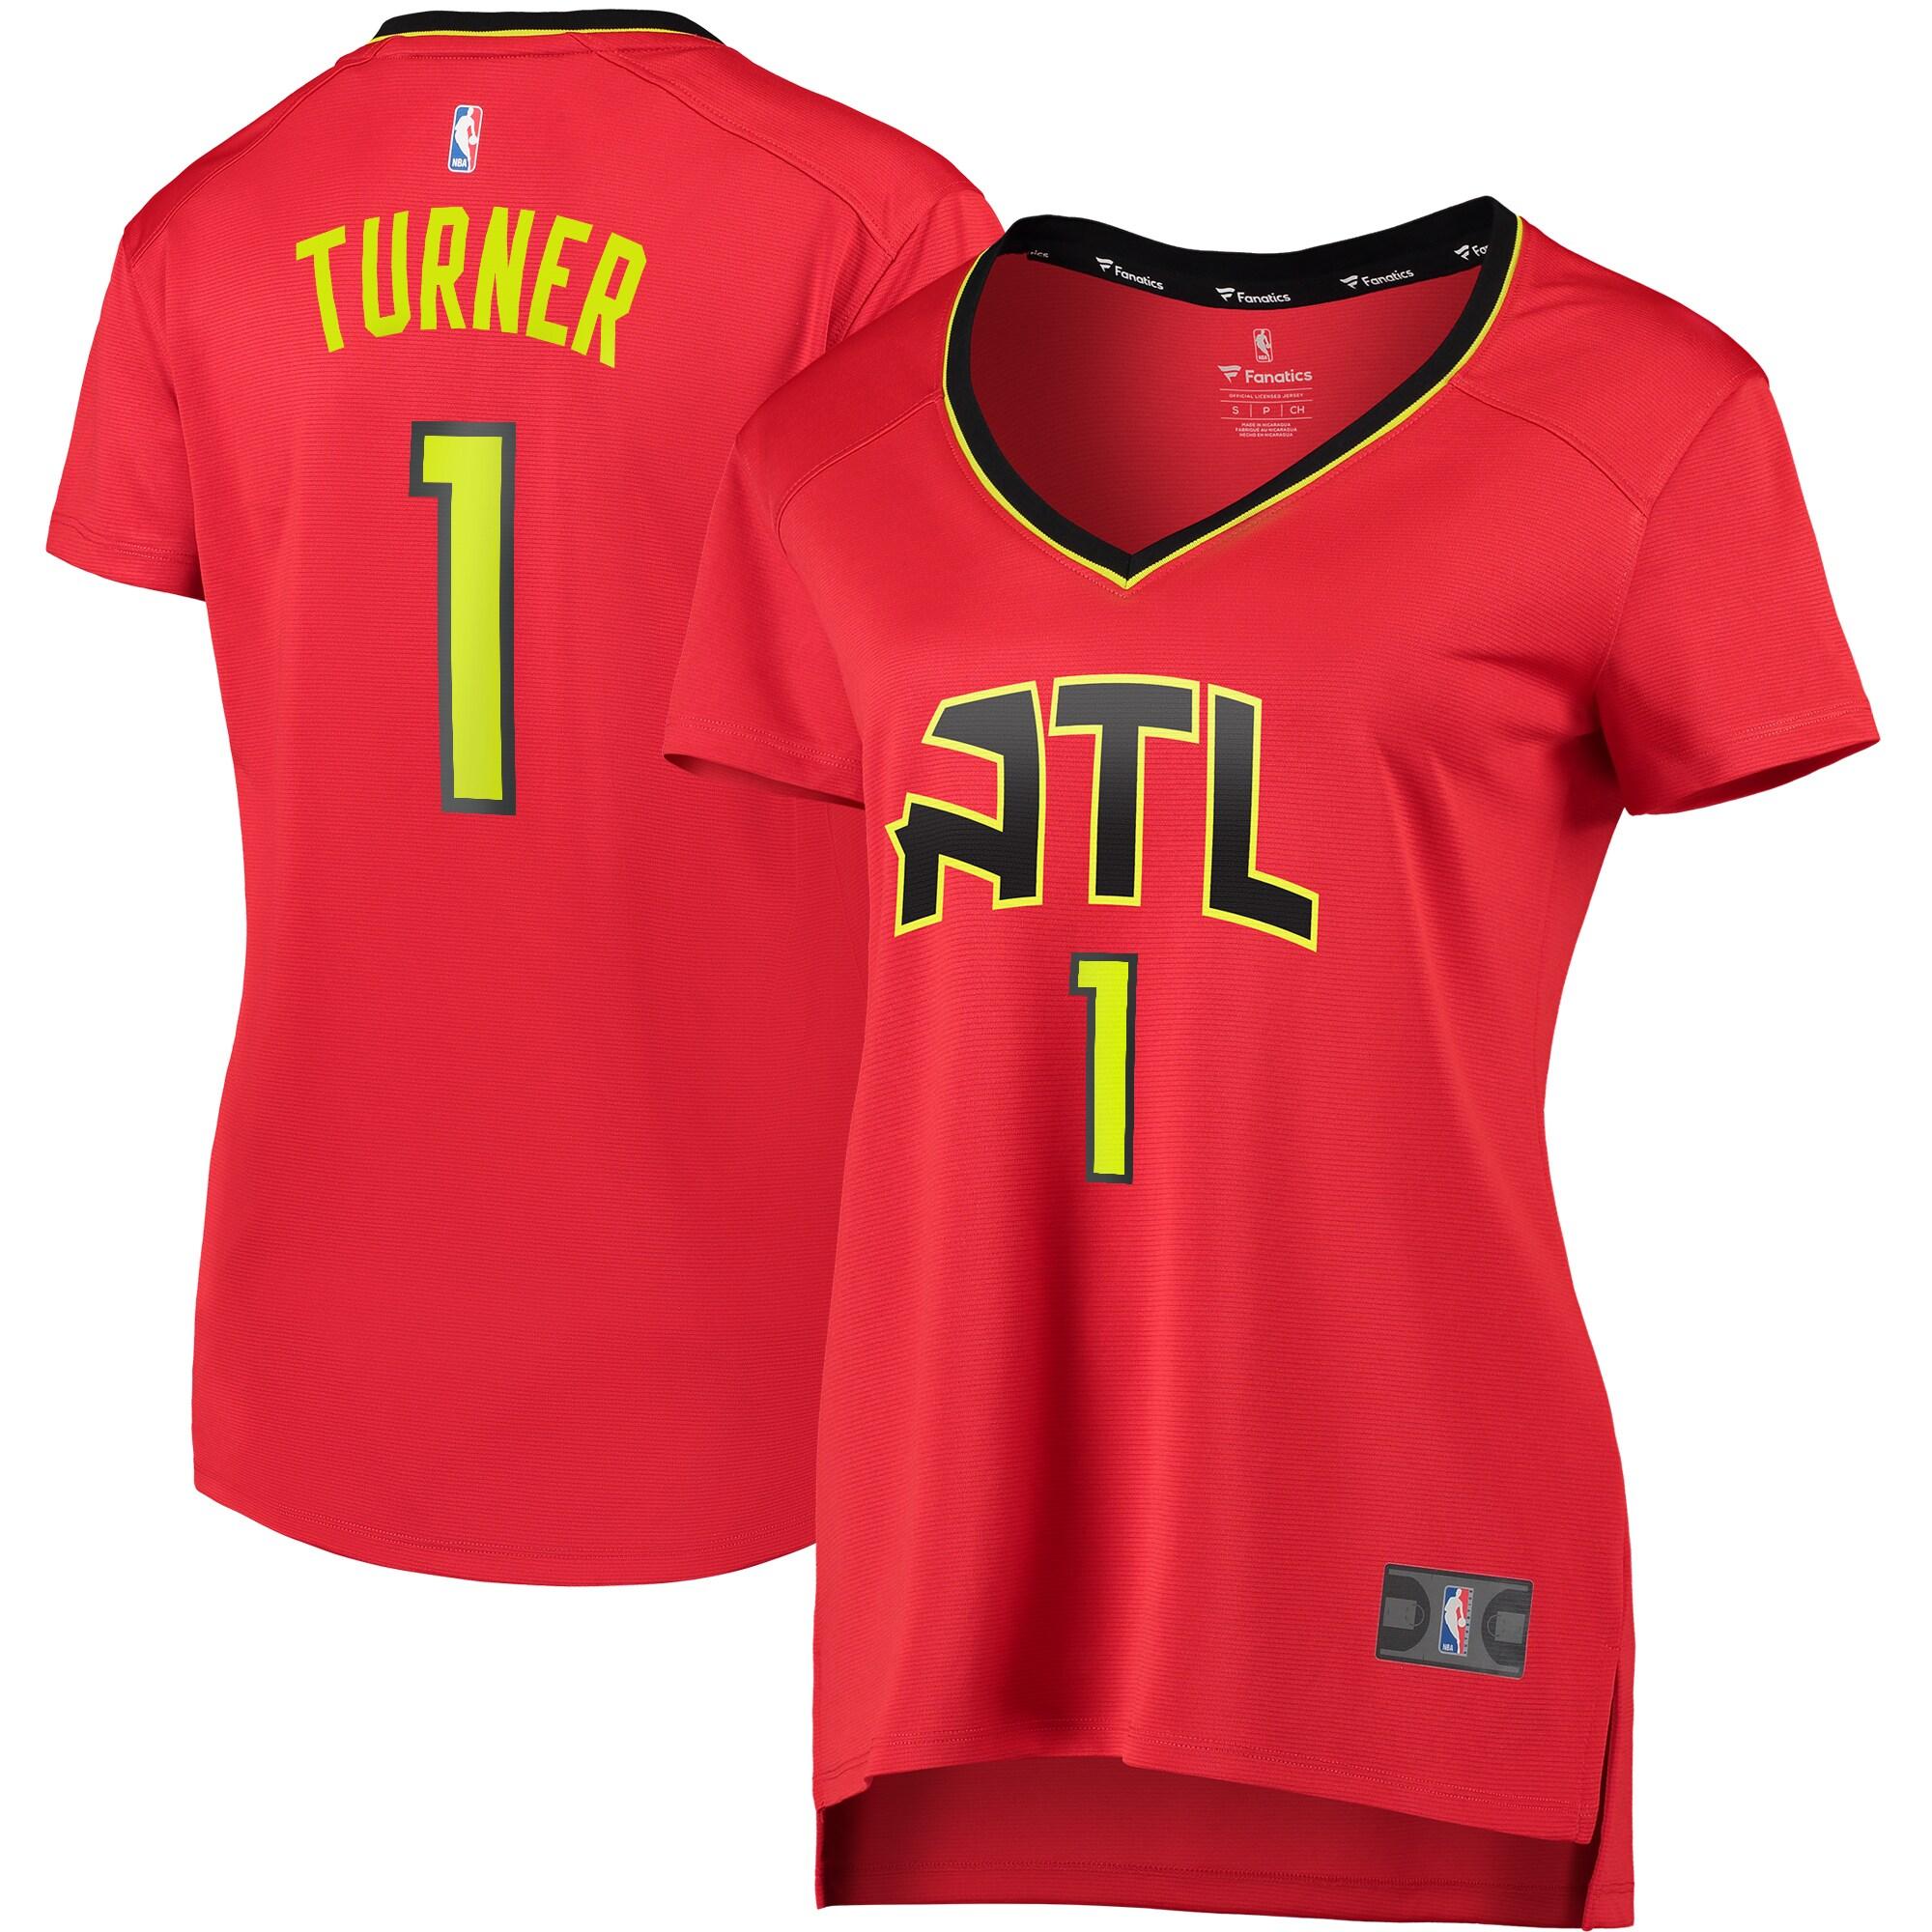 Evan Turner Atlanta Hawks Fanatics Branded Women's Fast Break Replica Jersey Red - Statement Edition